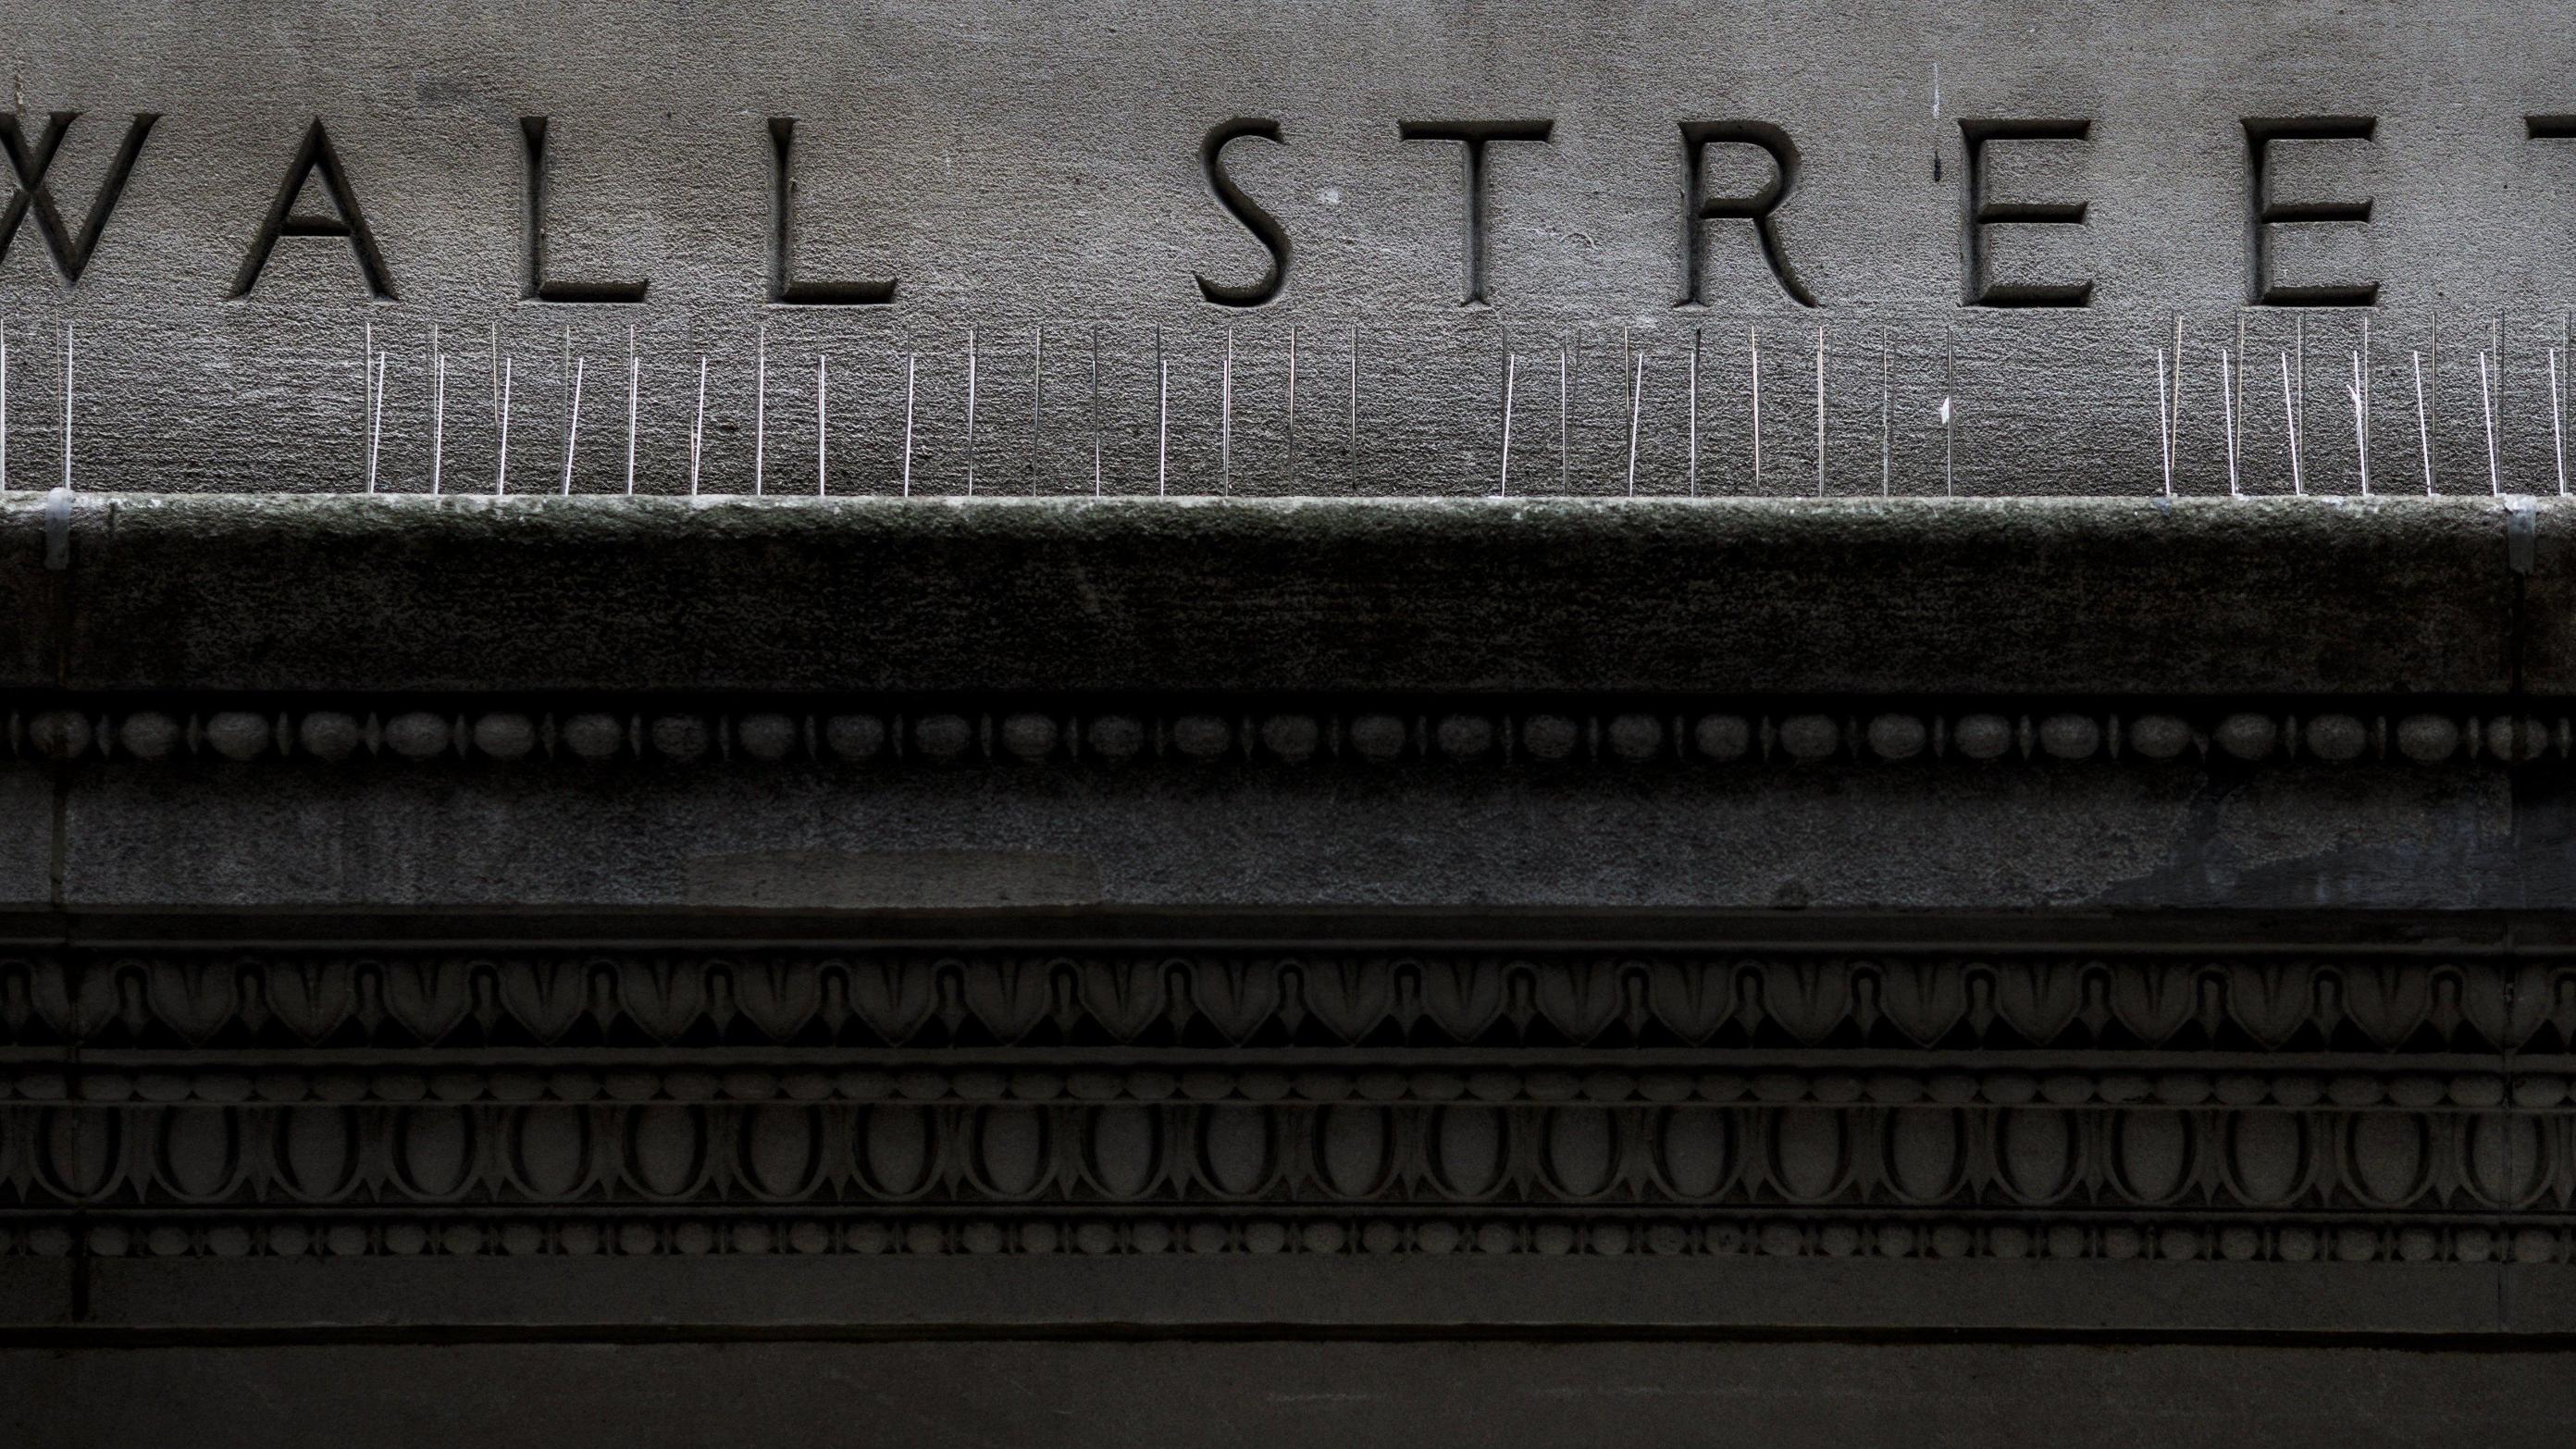 Borsa wall street apre positiva virgilio notizie for Ufficio wall street